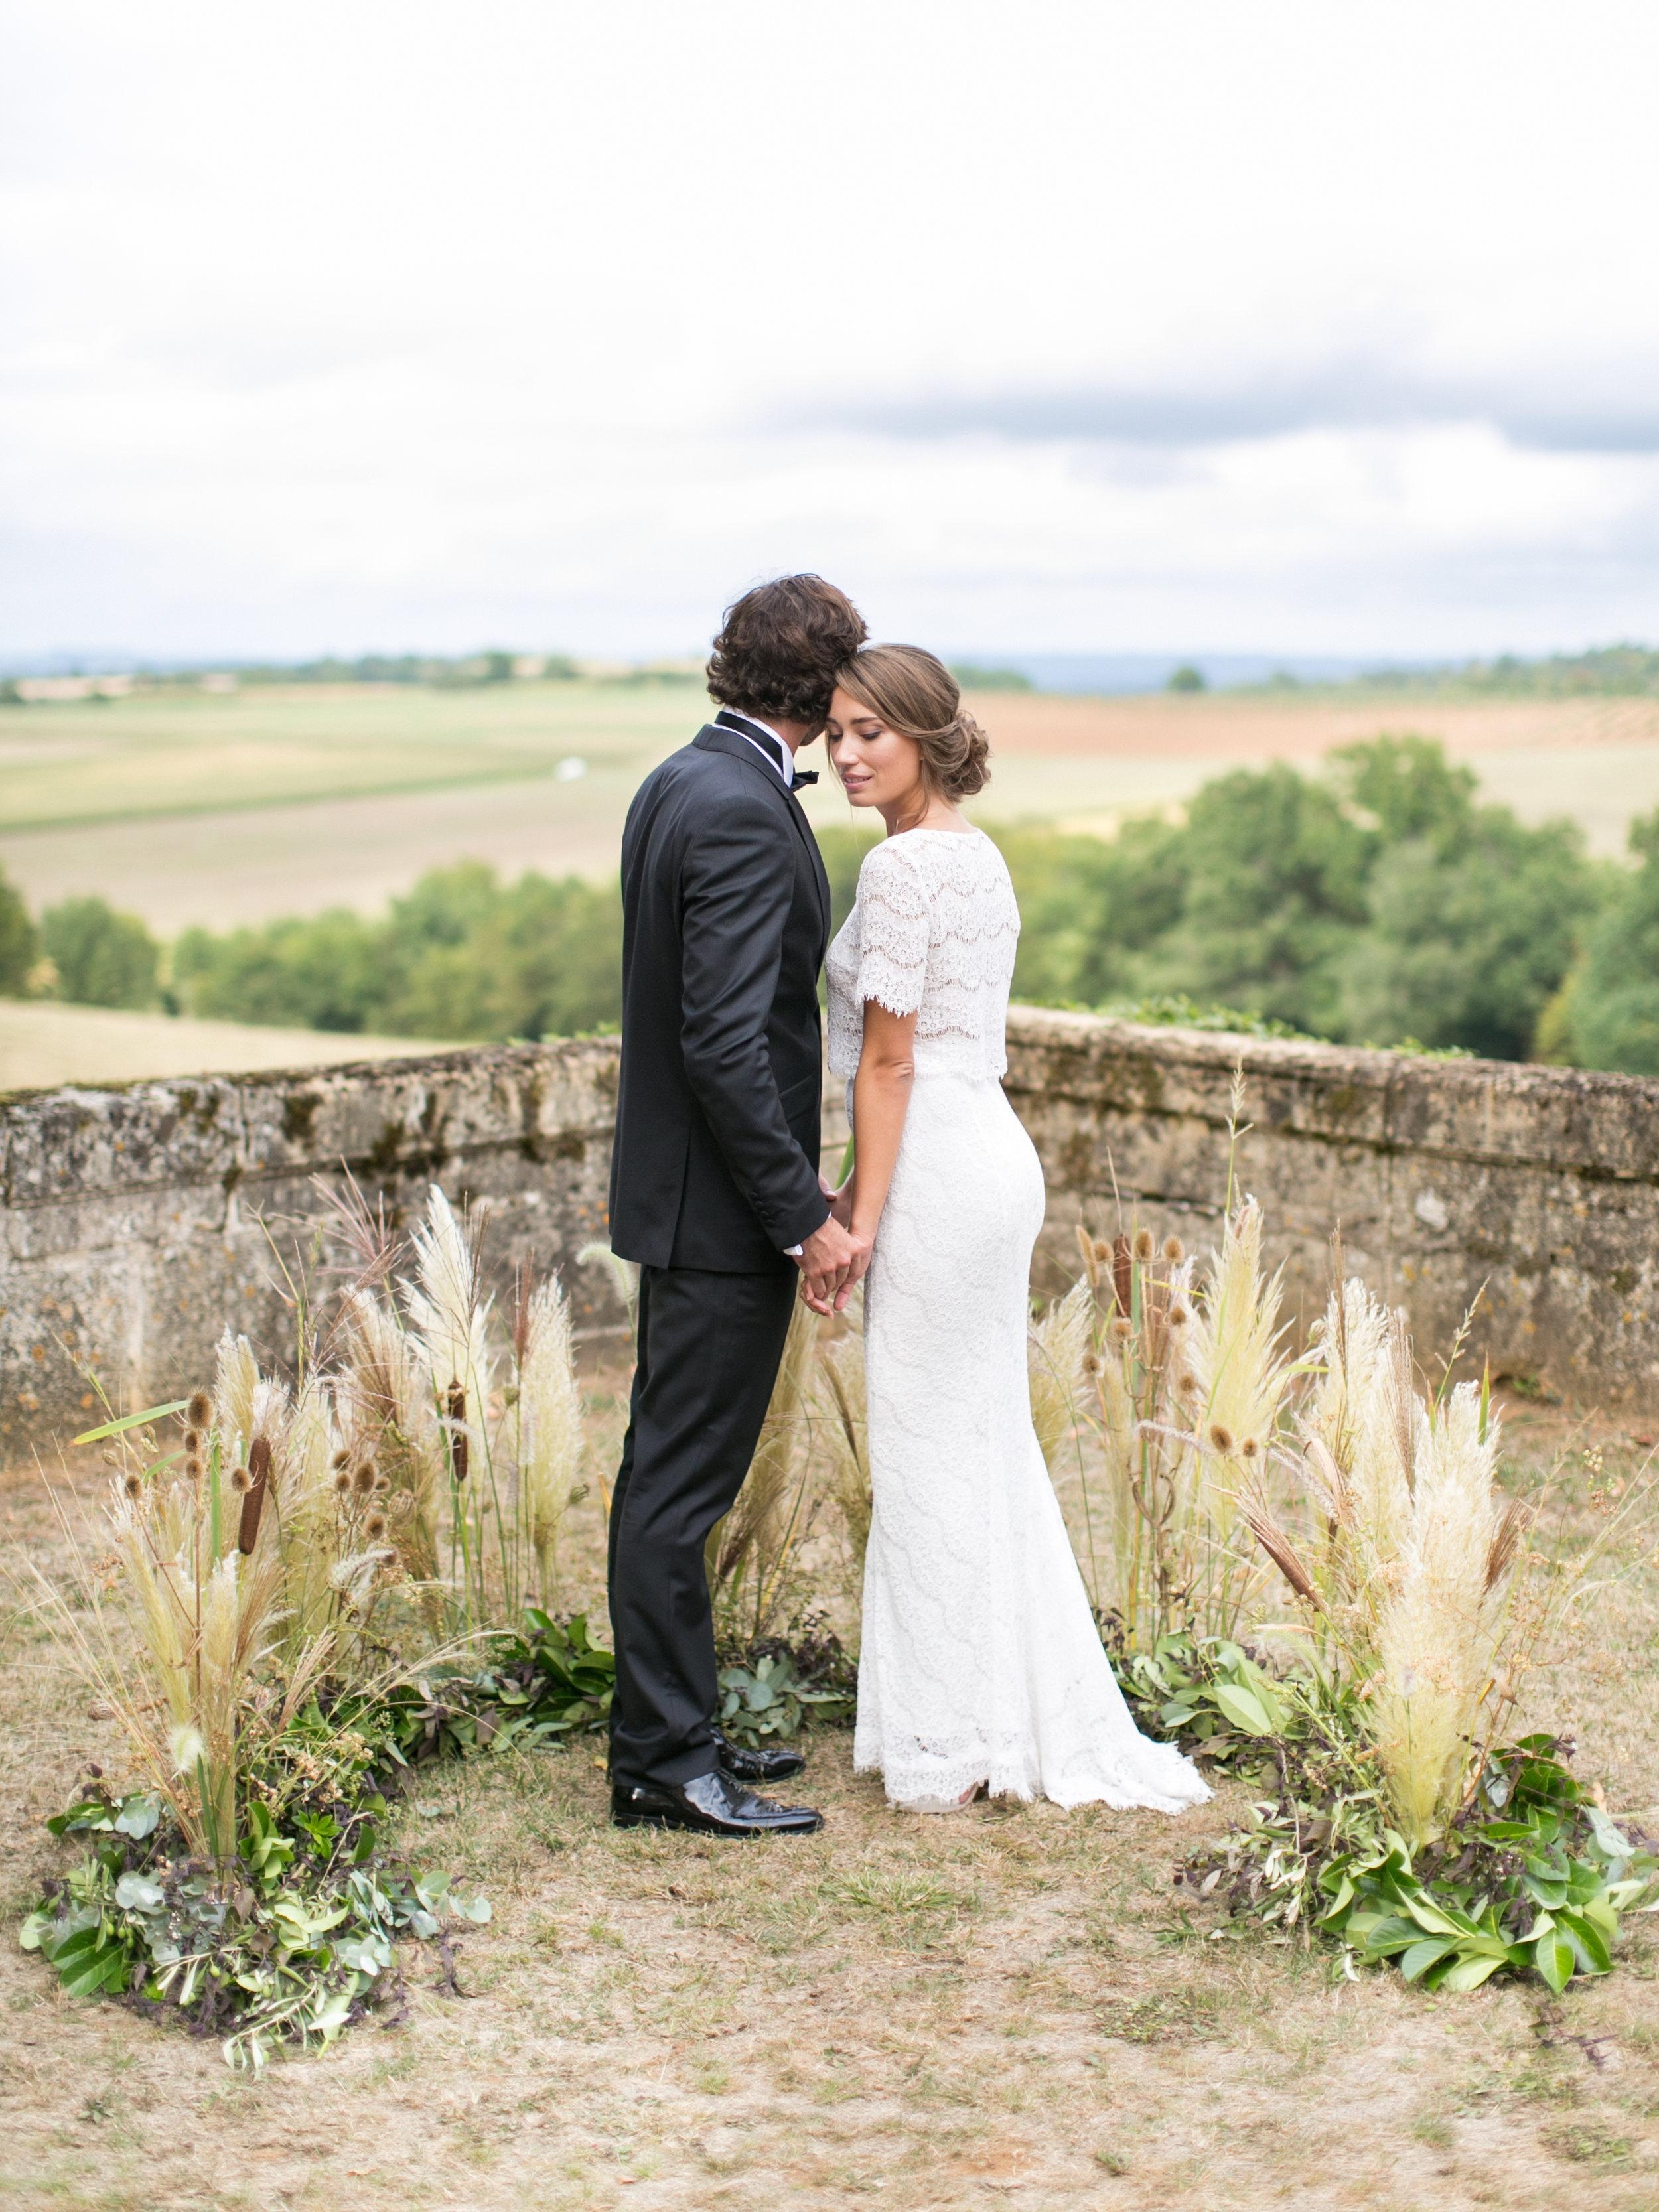 Chateau-de-Redon-Wedding-Anneli-Marinovich-Photography-126.jpg